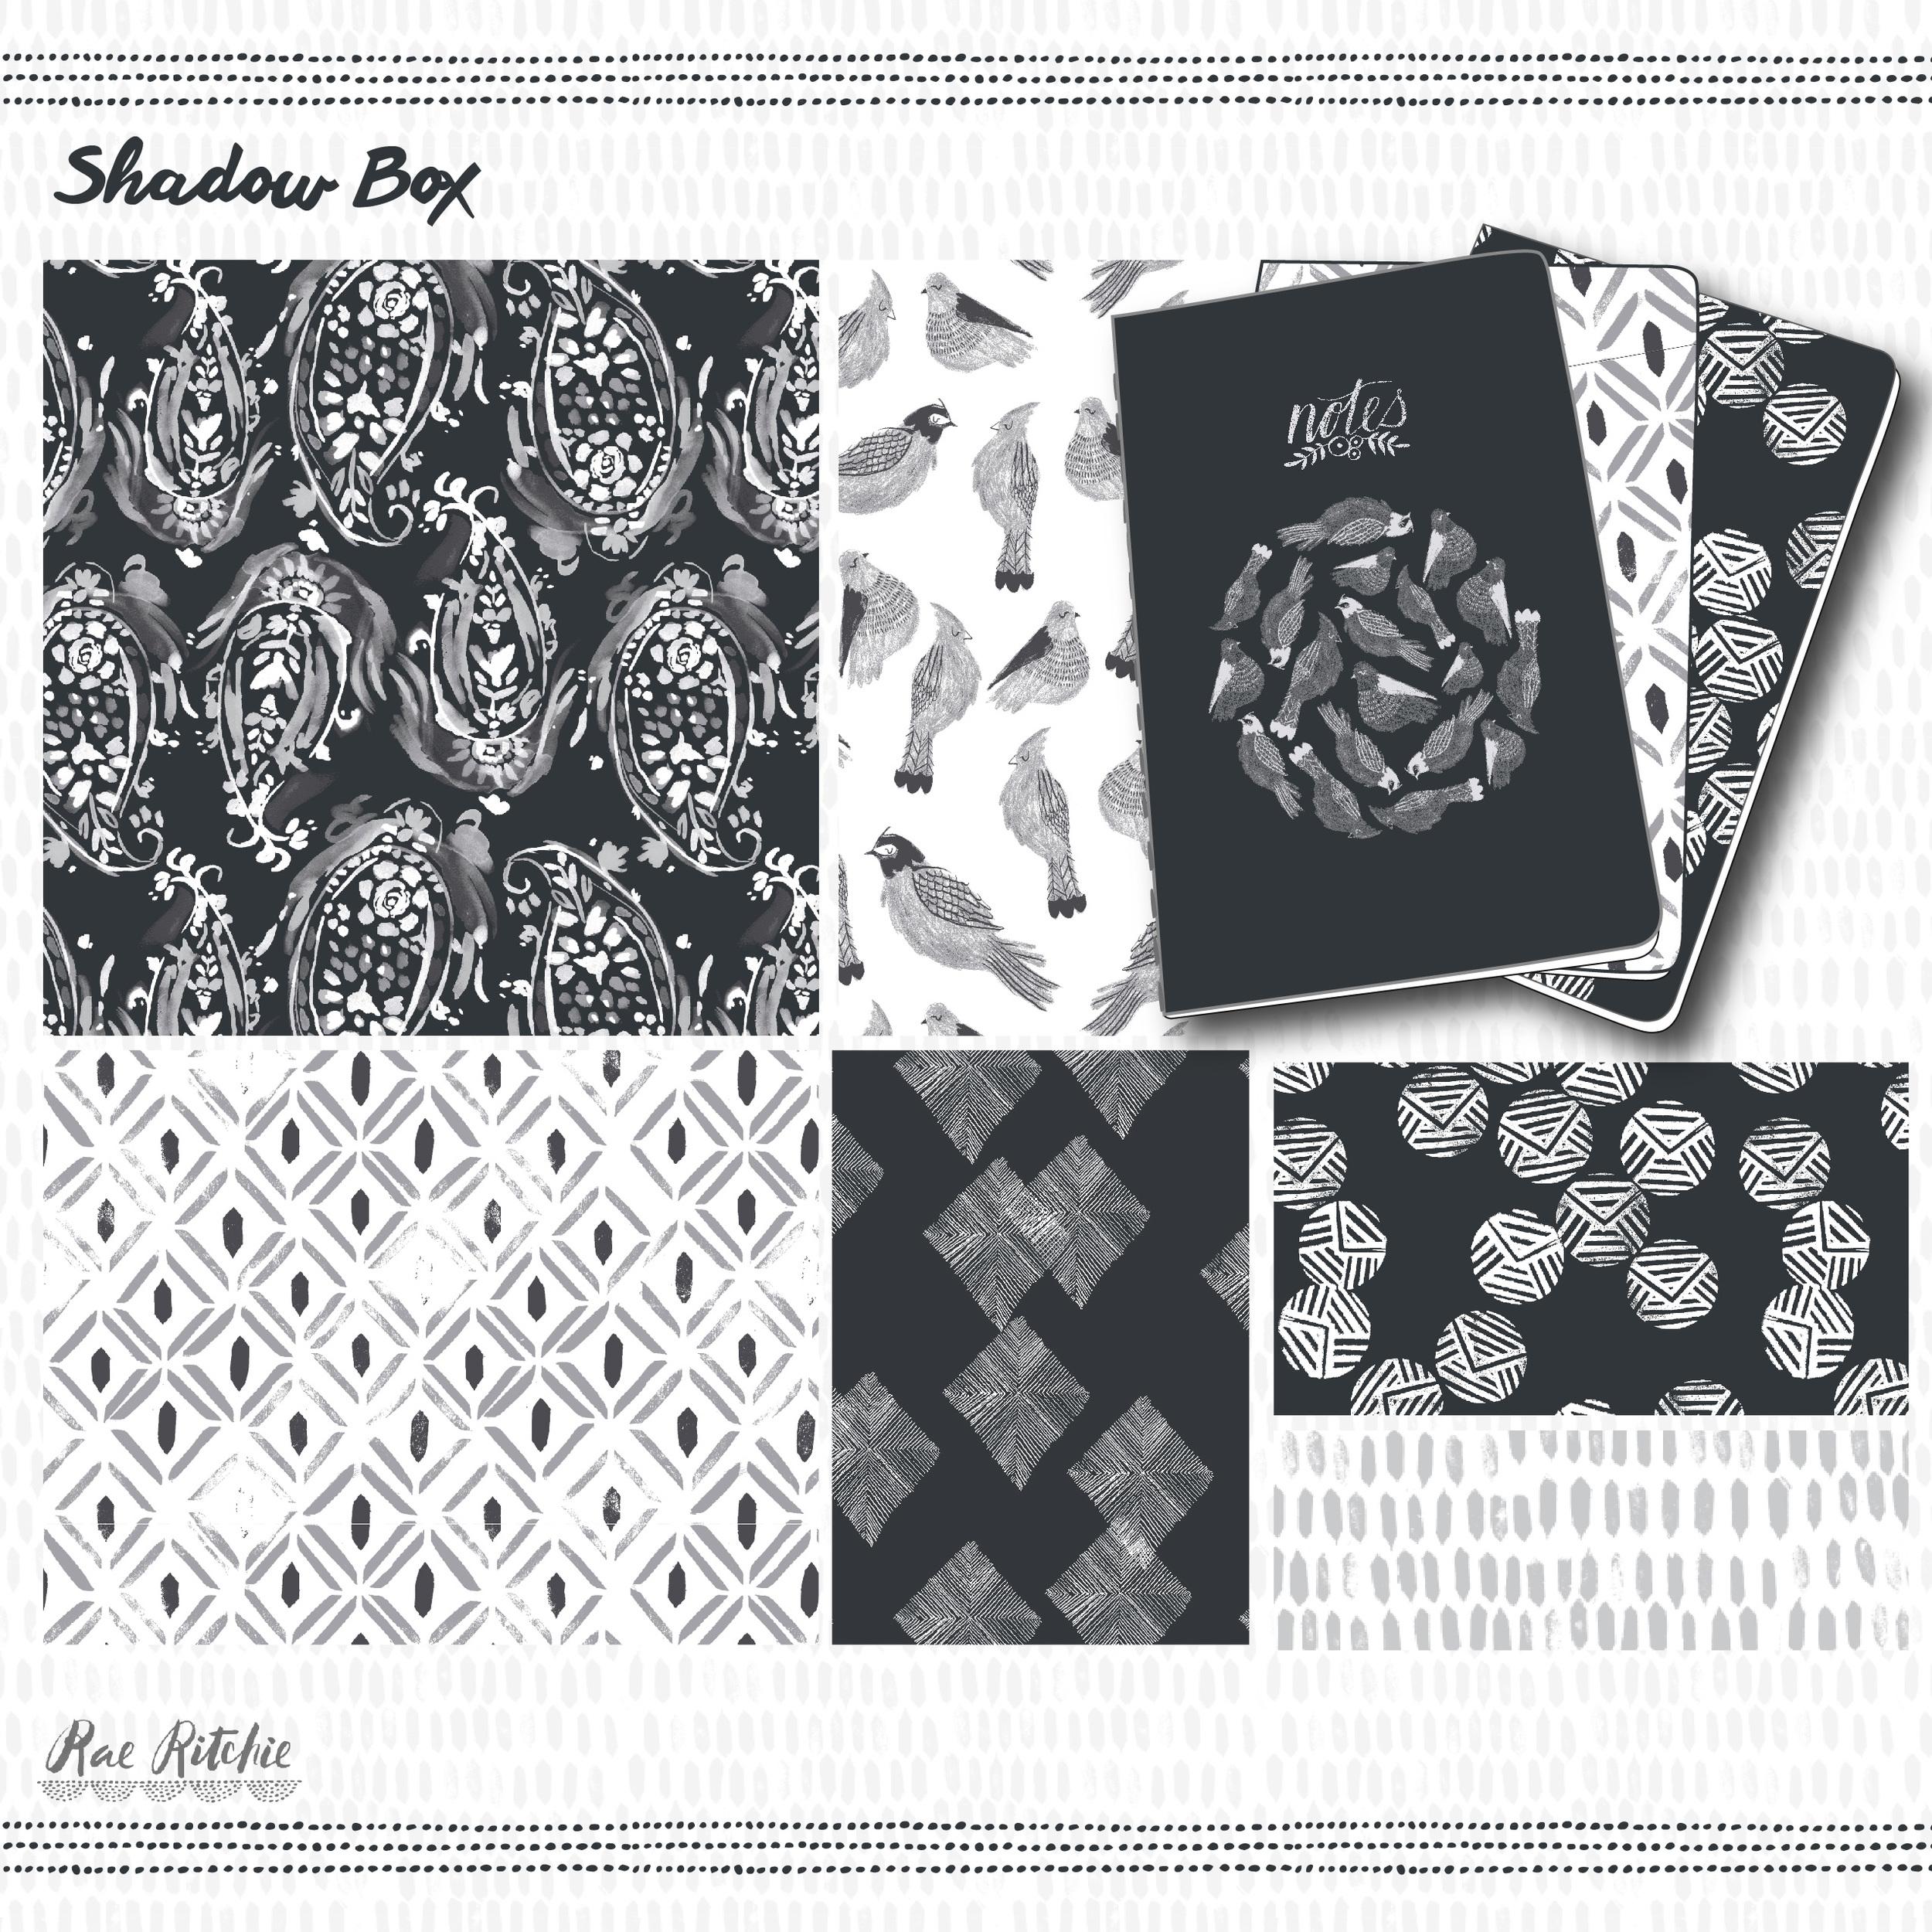 Shadow Box-01.jpg